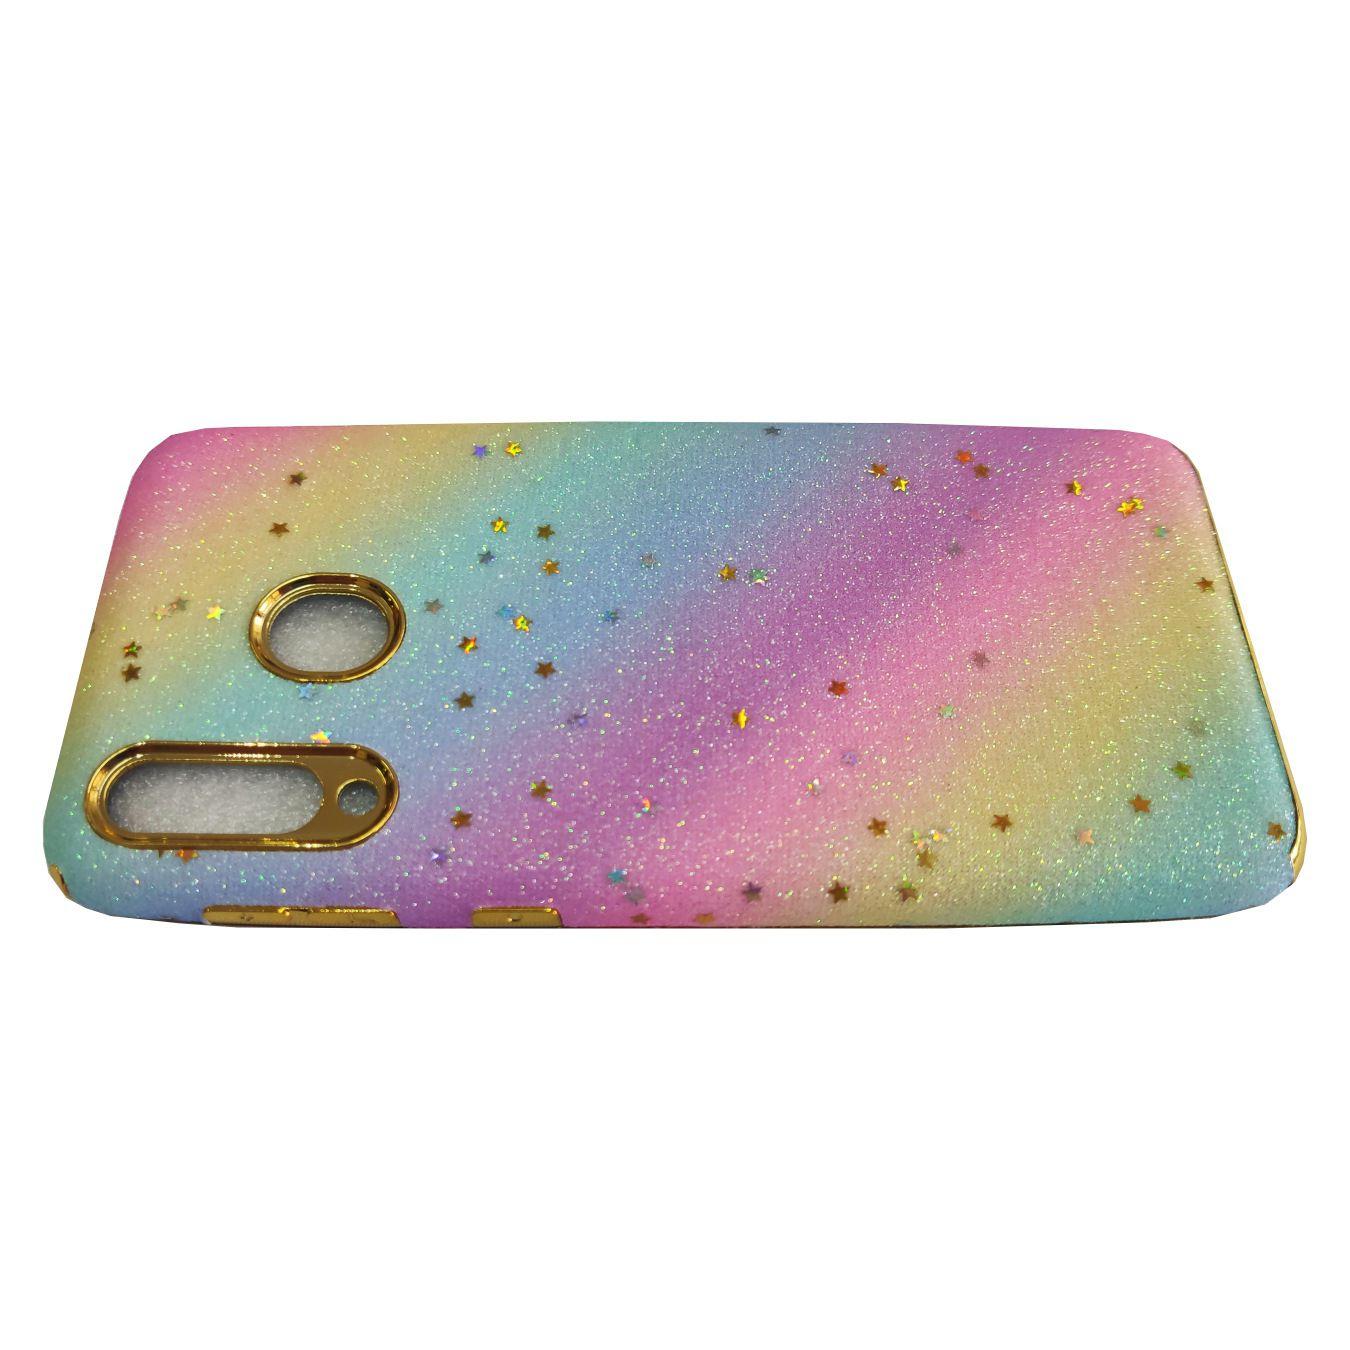 Capinha Anti-Impacto Arco-Íris Glitter